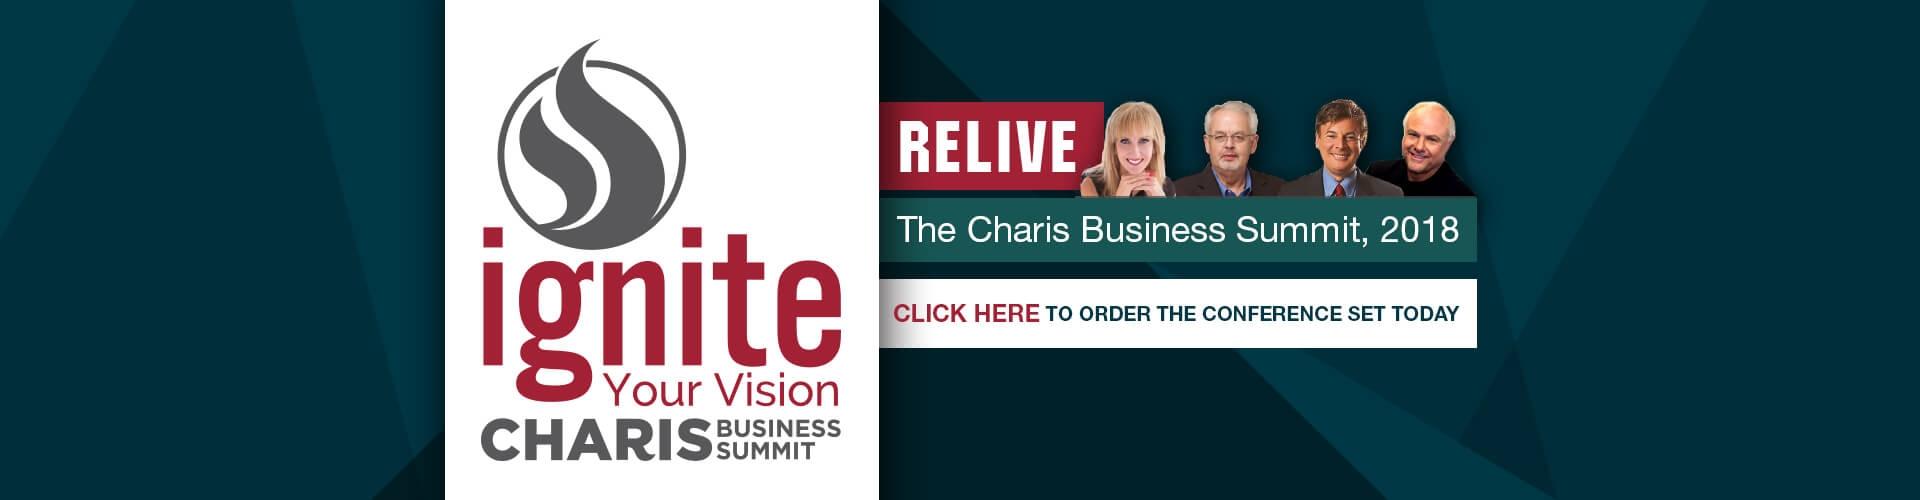 Business Summit Banner-lg